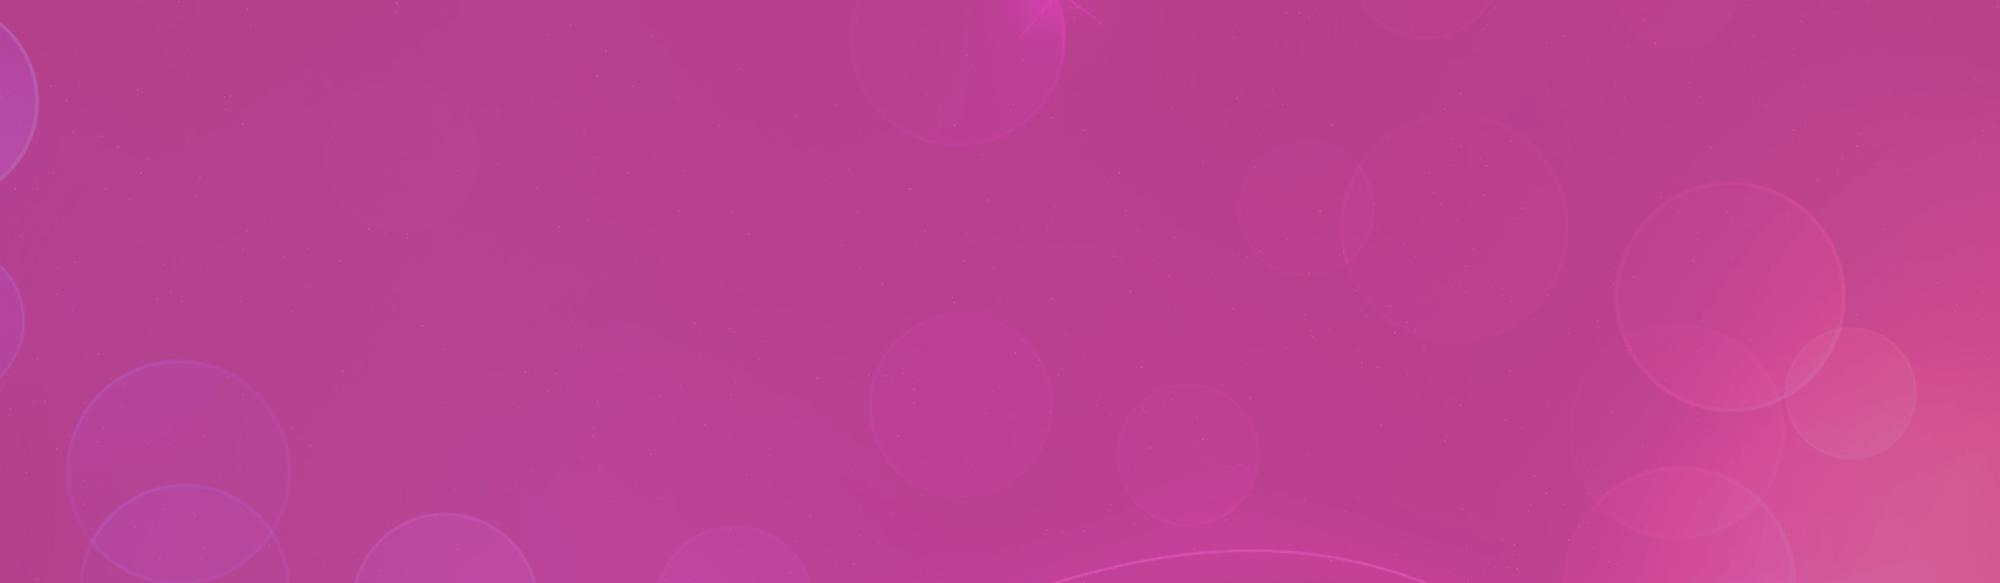 PinkBubblesSlider